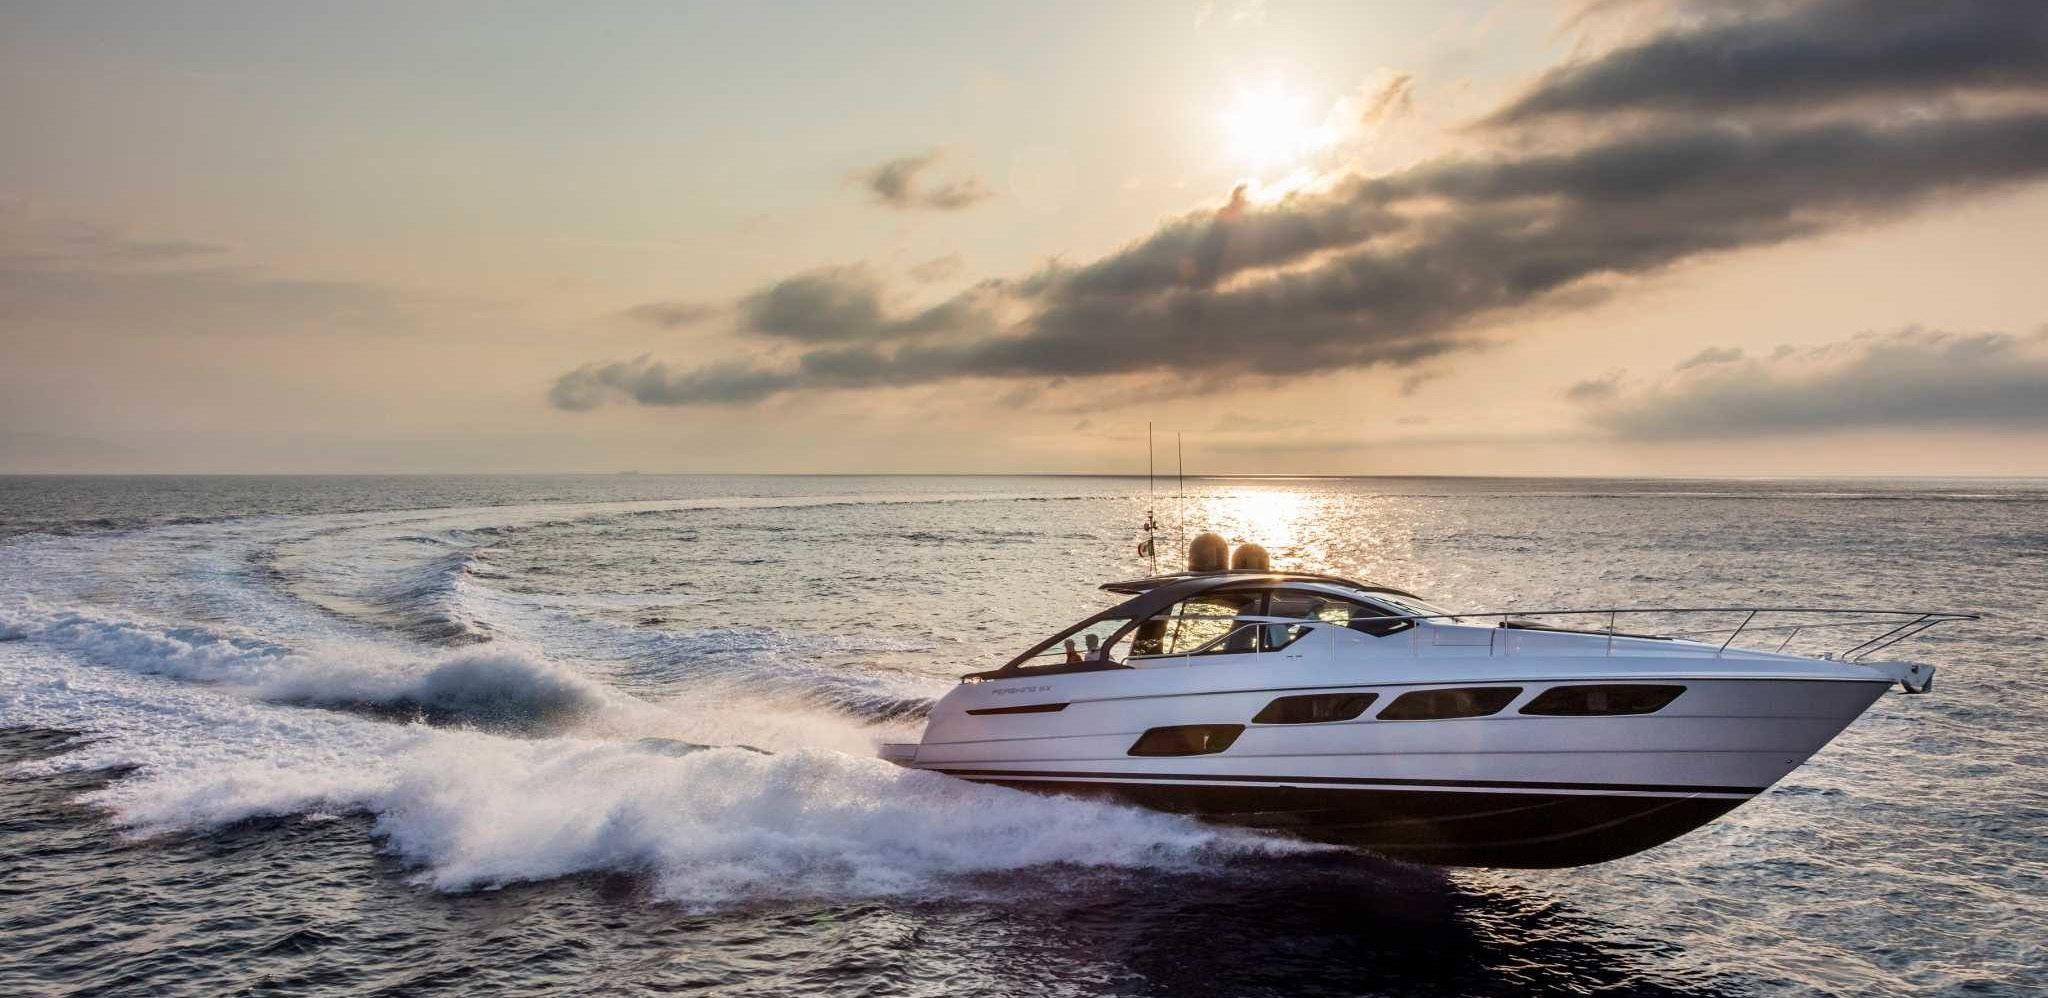 Dreamline yachts